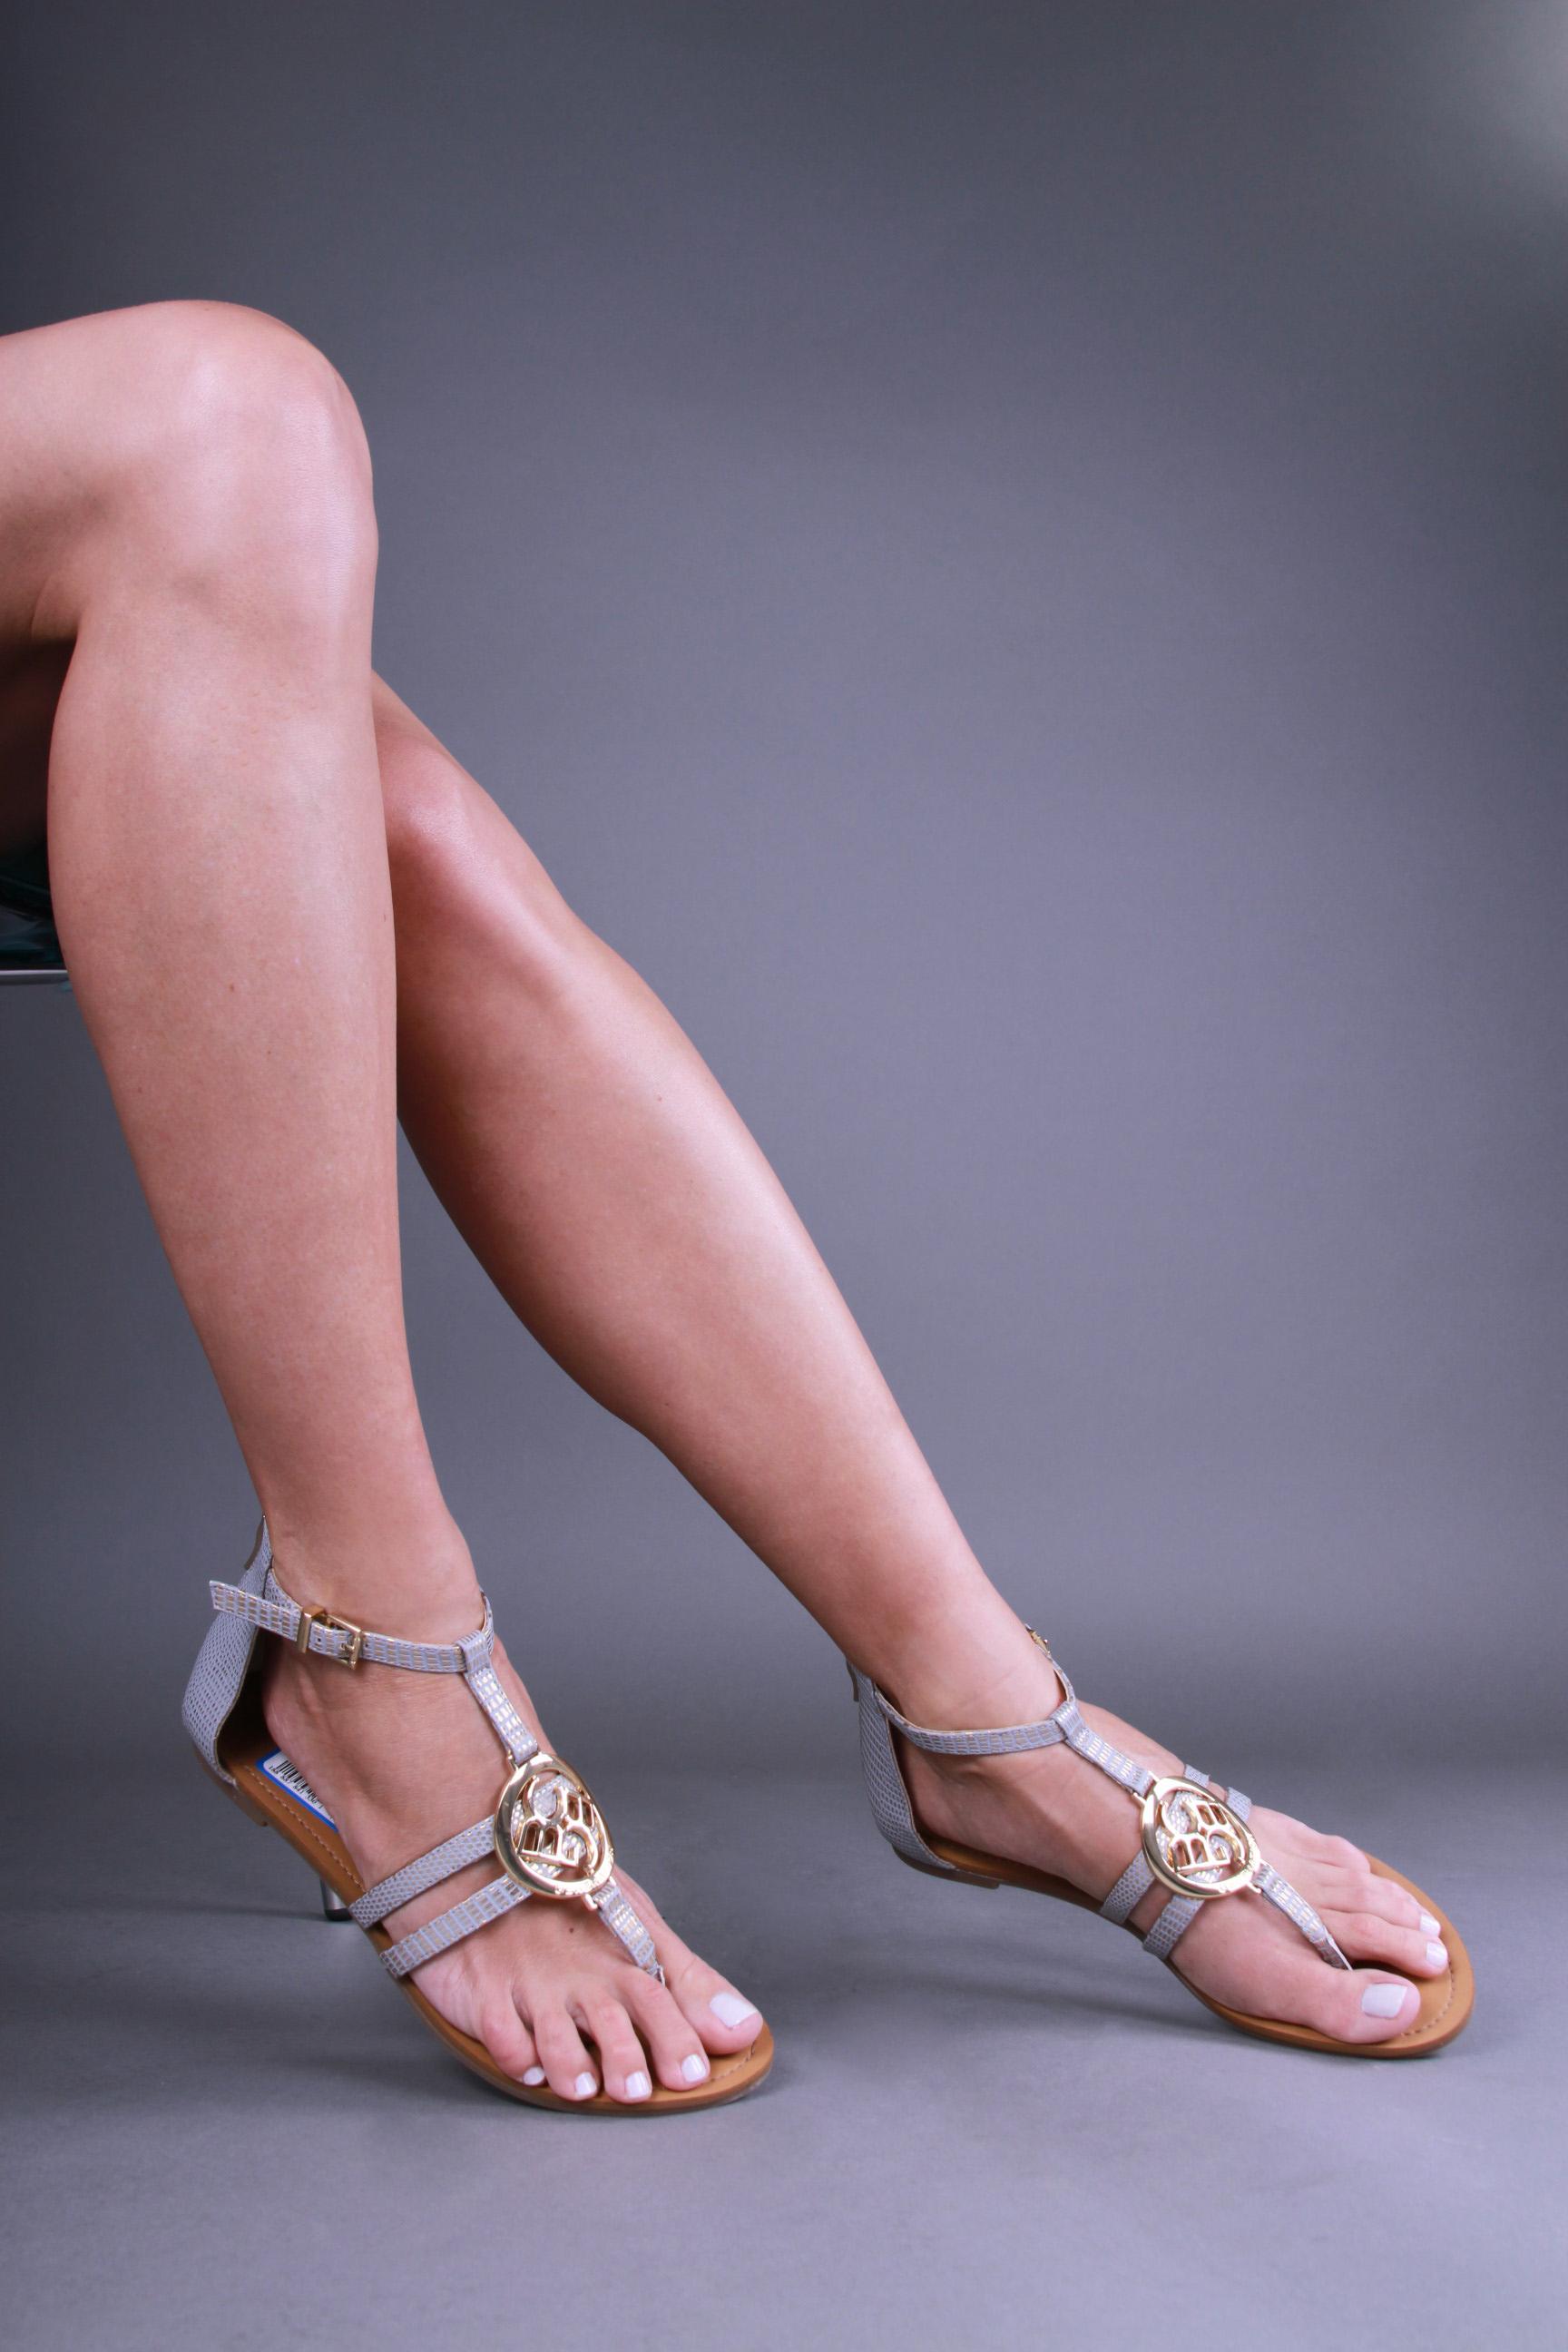 Silvia Kal_Feet3